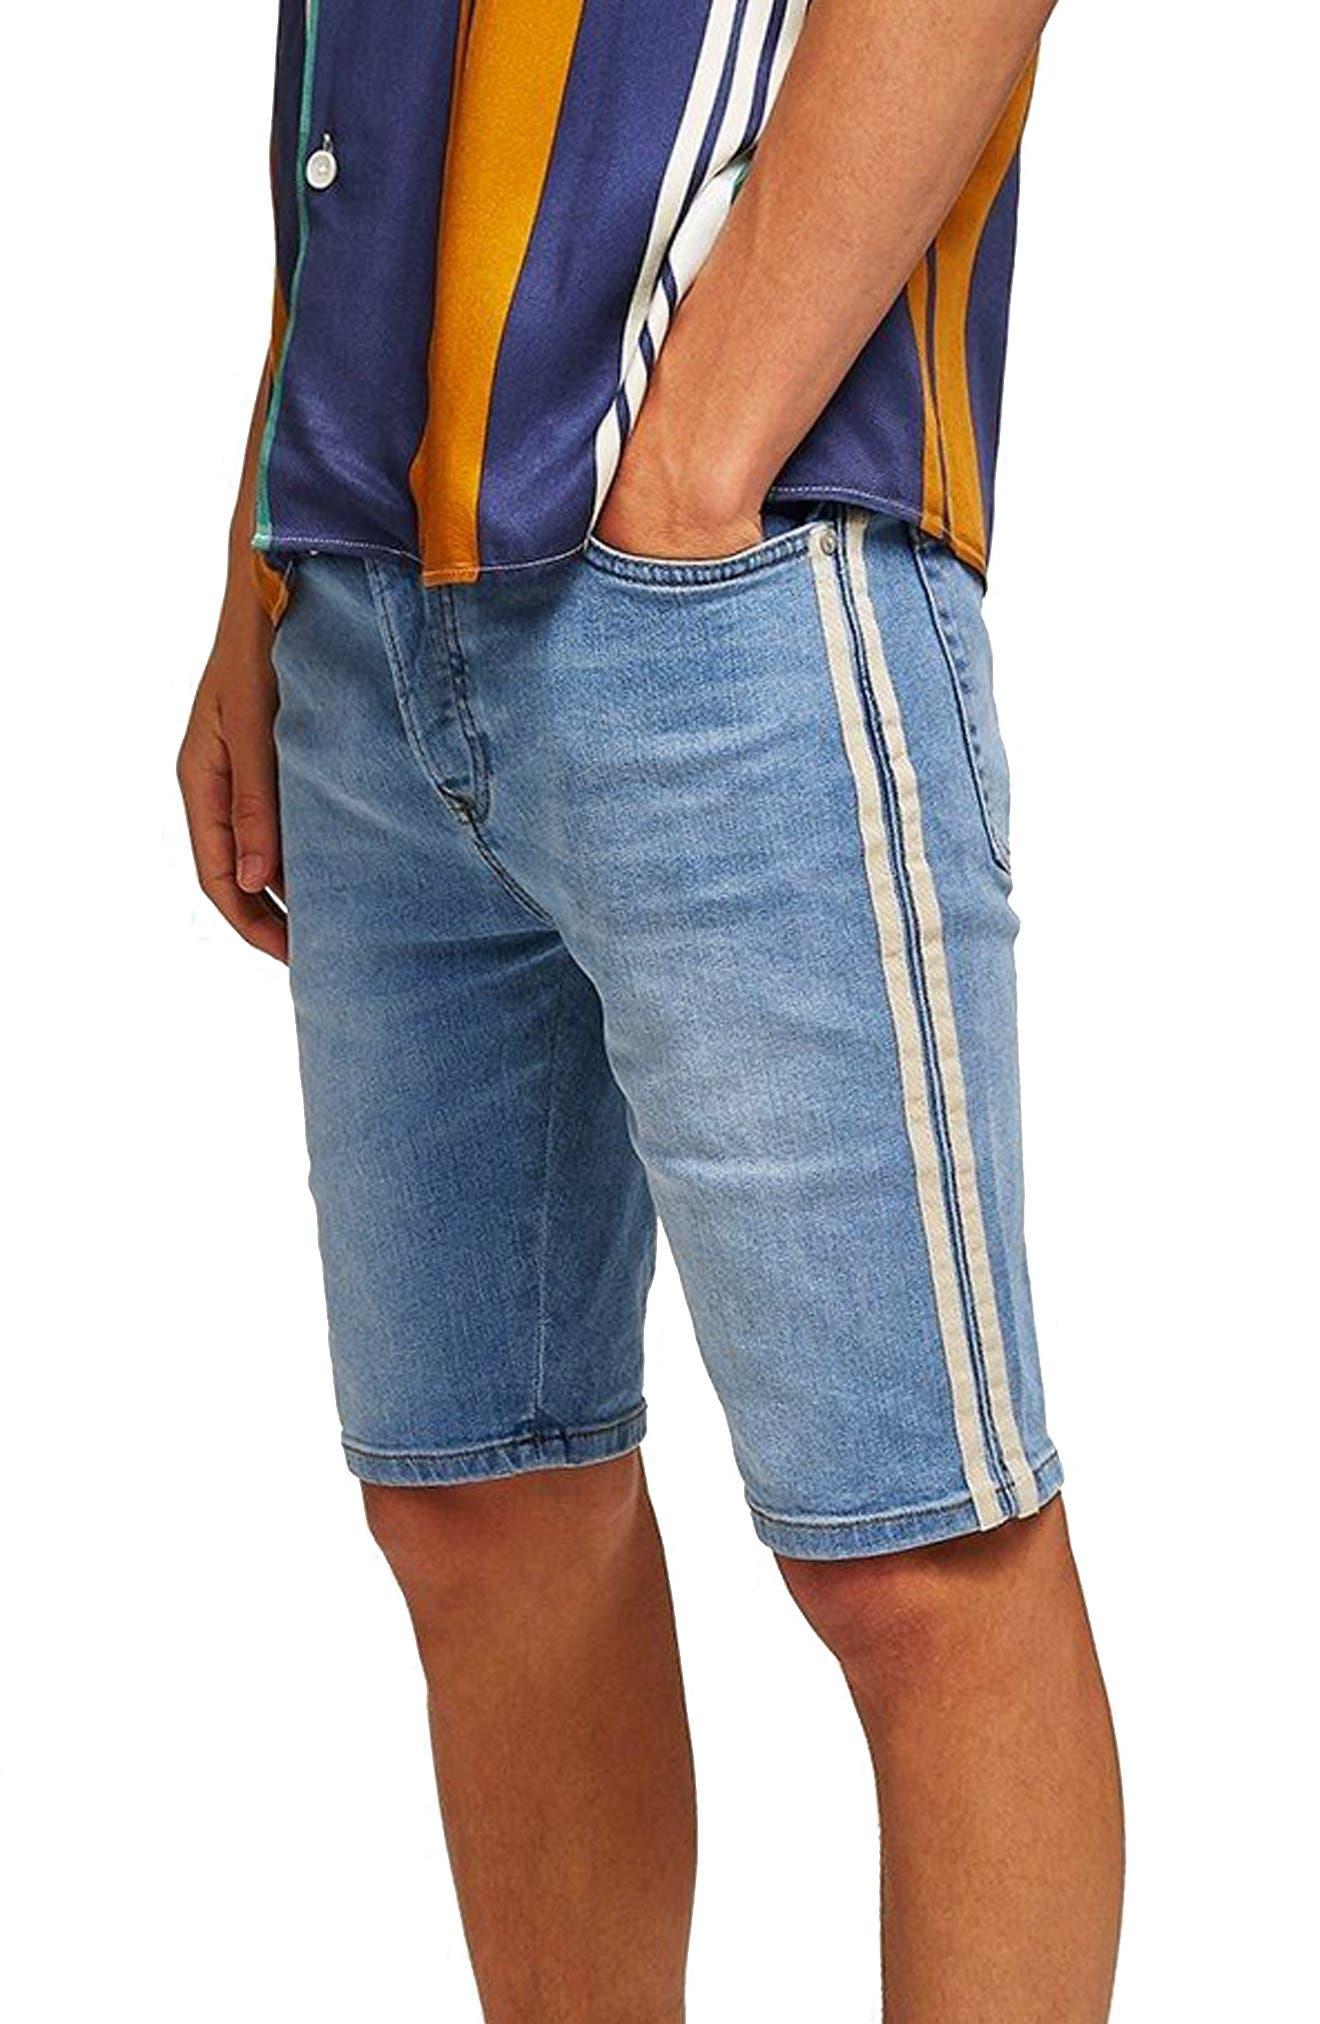 Tape Stretch Skinny Fit Denim Shorts,                             Main thumbnail 1, color,                             400